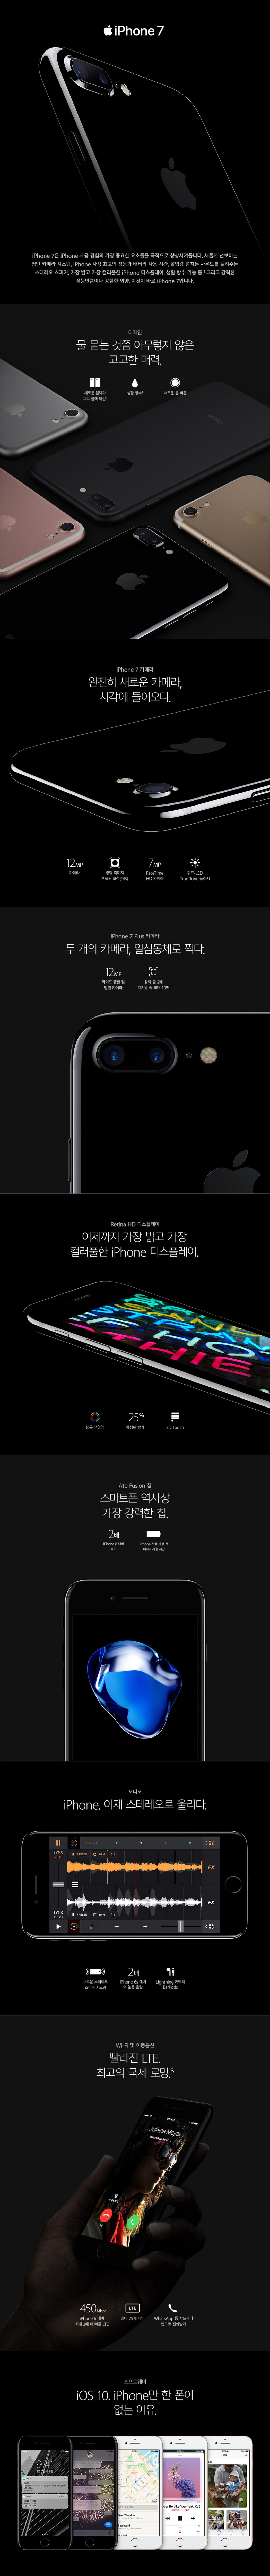 http://www.kt-mobile.com/bs/se2/imgup/1523119261aip7_00.jpg